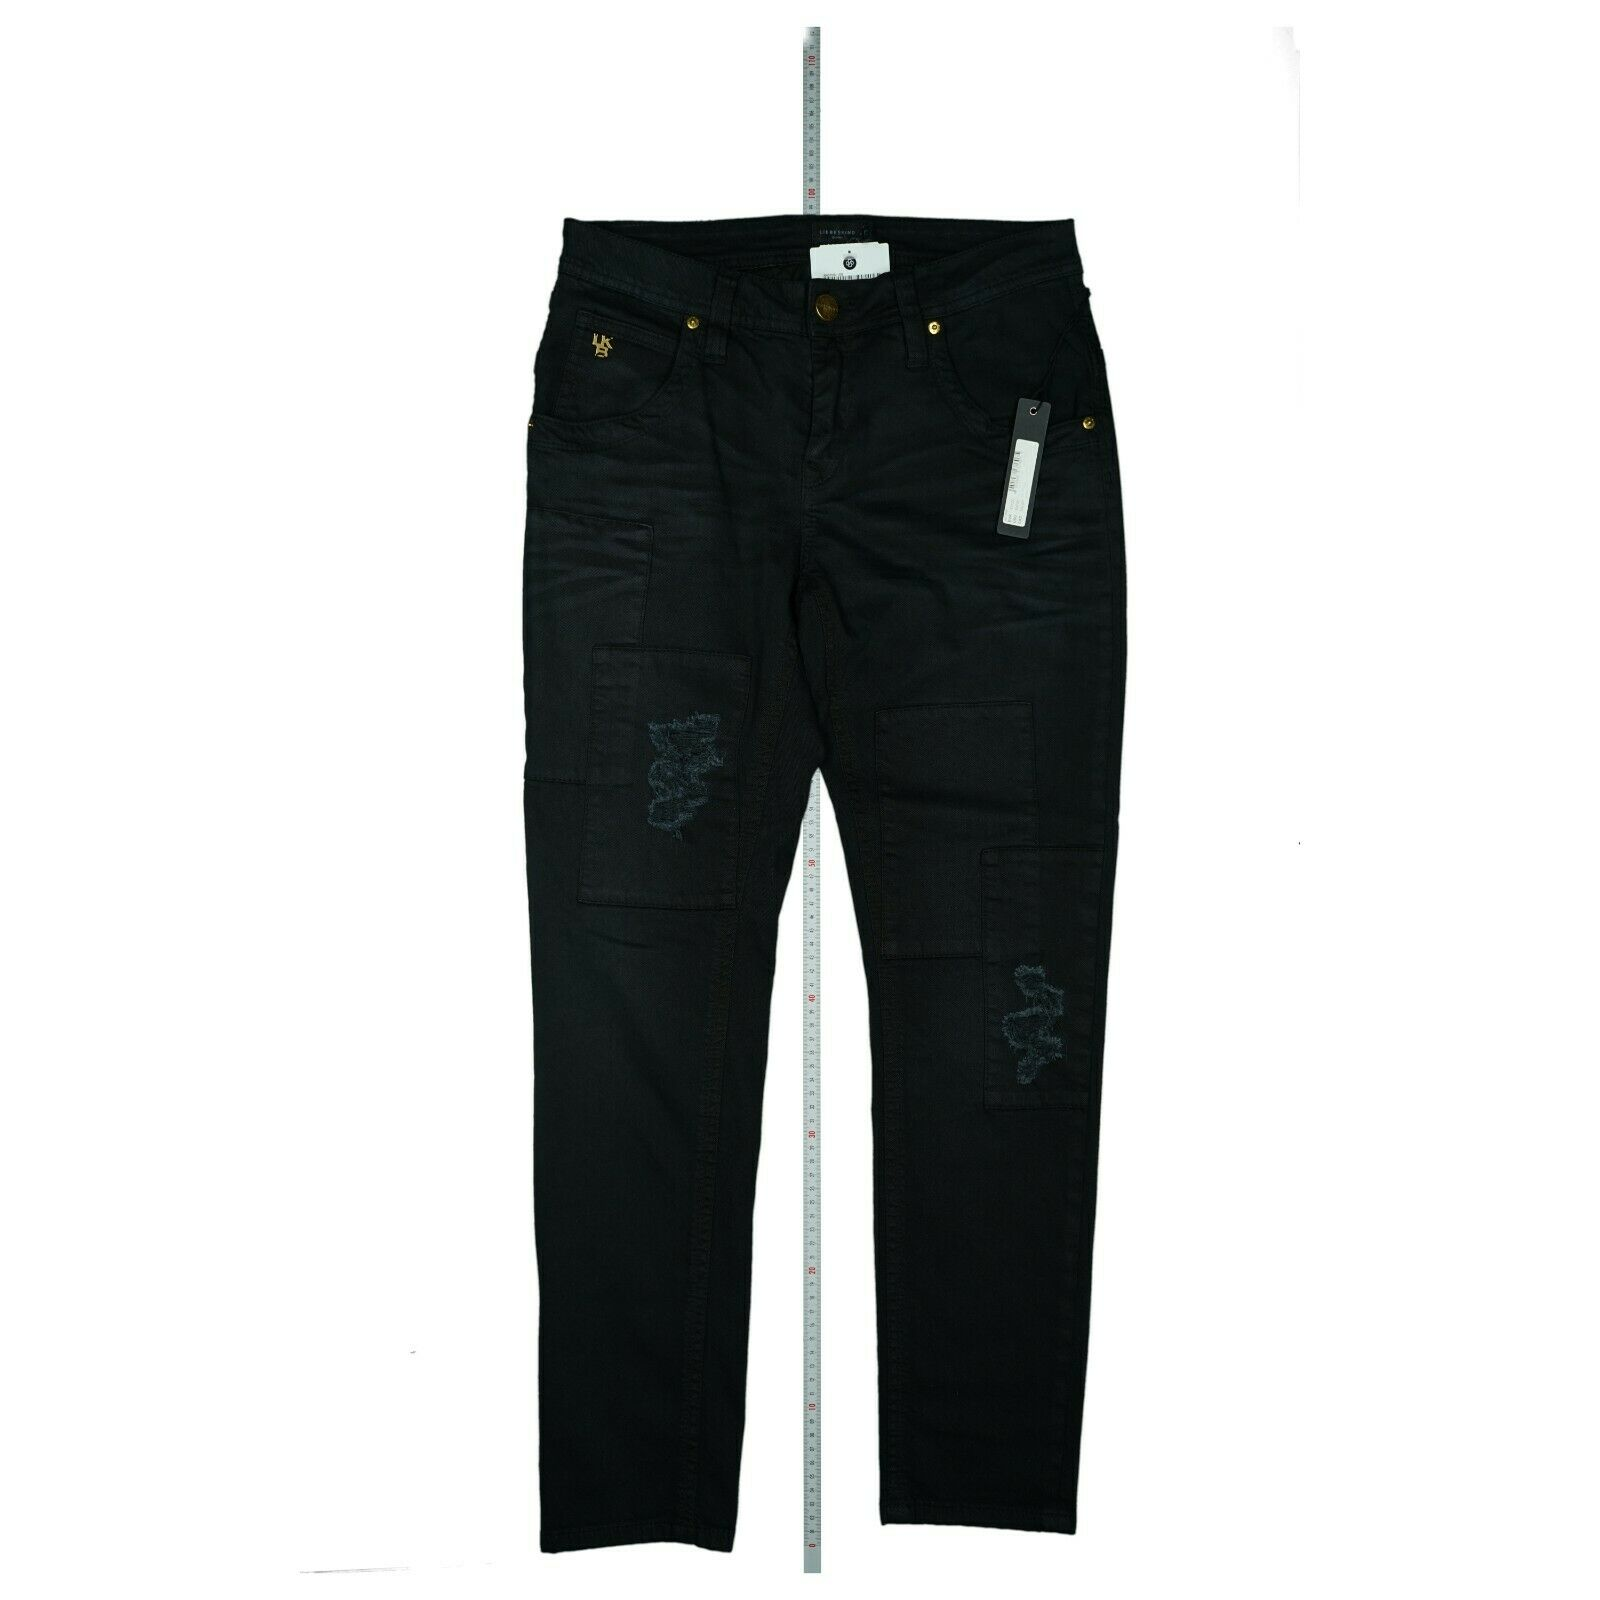 LIEBESKIND Damen Stretch Jeans Hose slim destroyed W30 L30 used look schwarz NEU